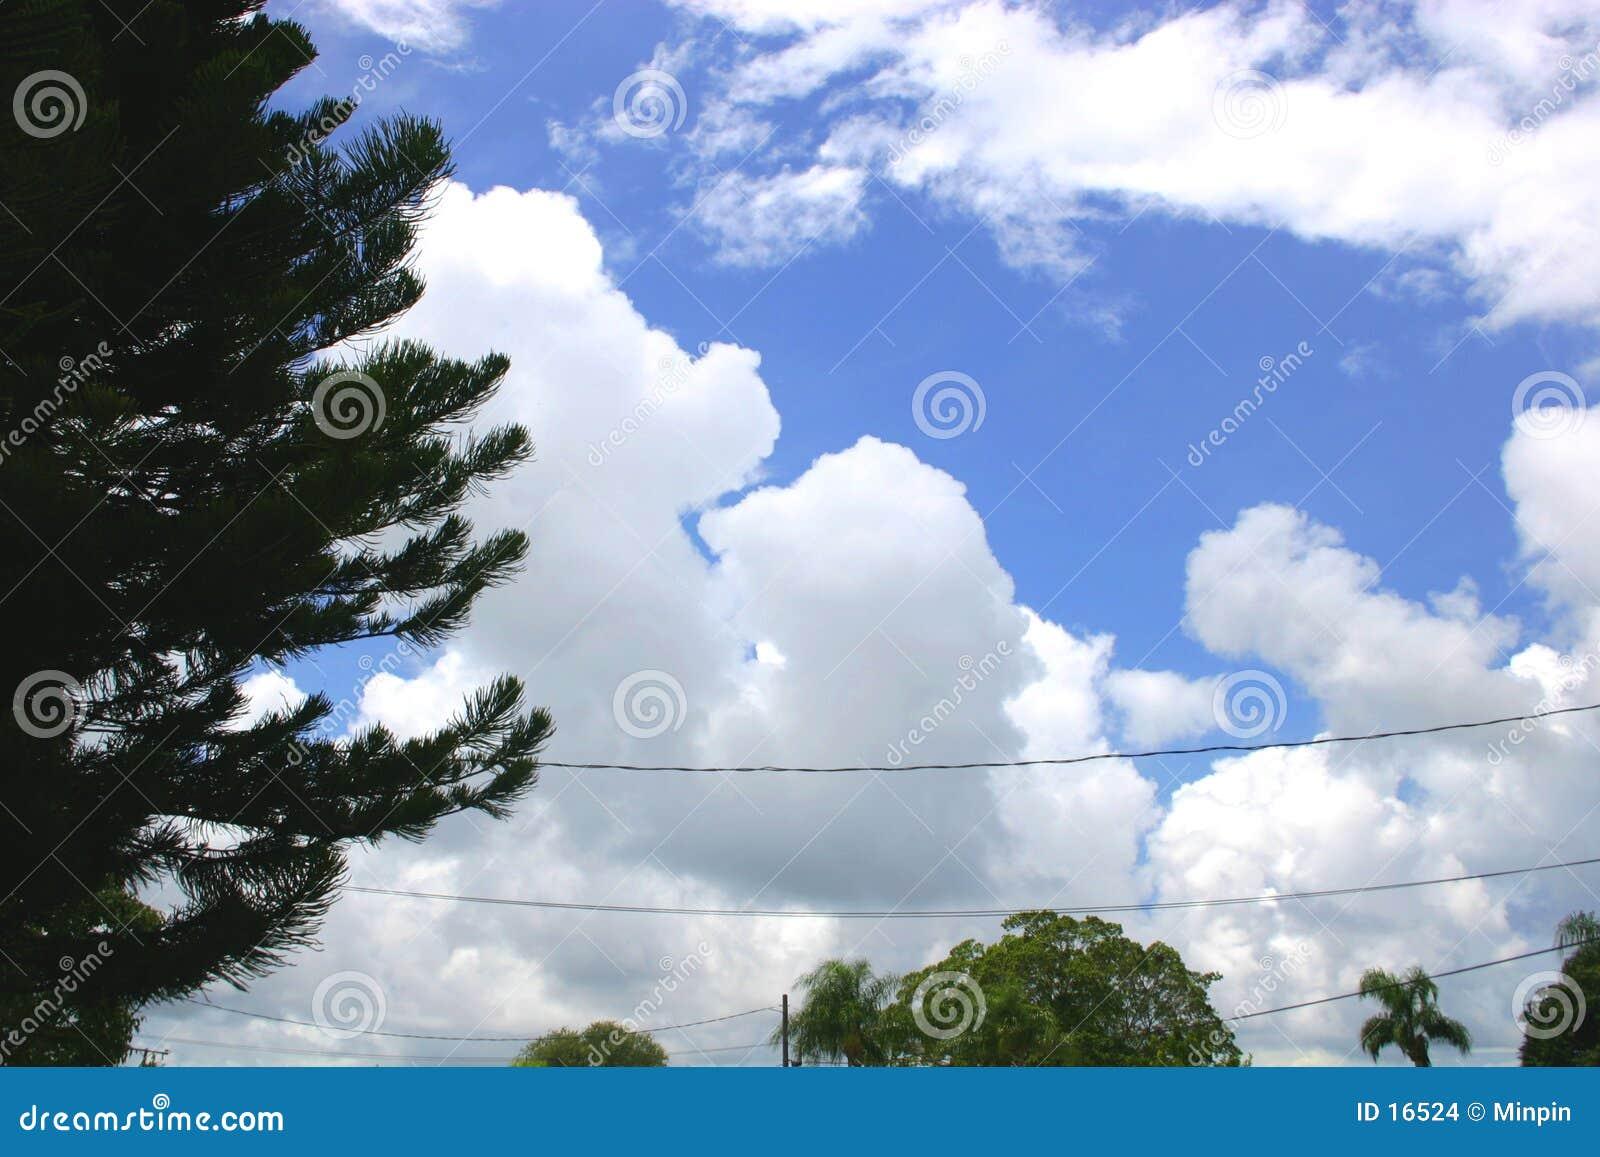 Frunce de las nubes de tormenta